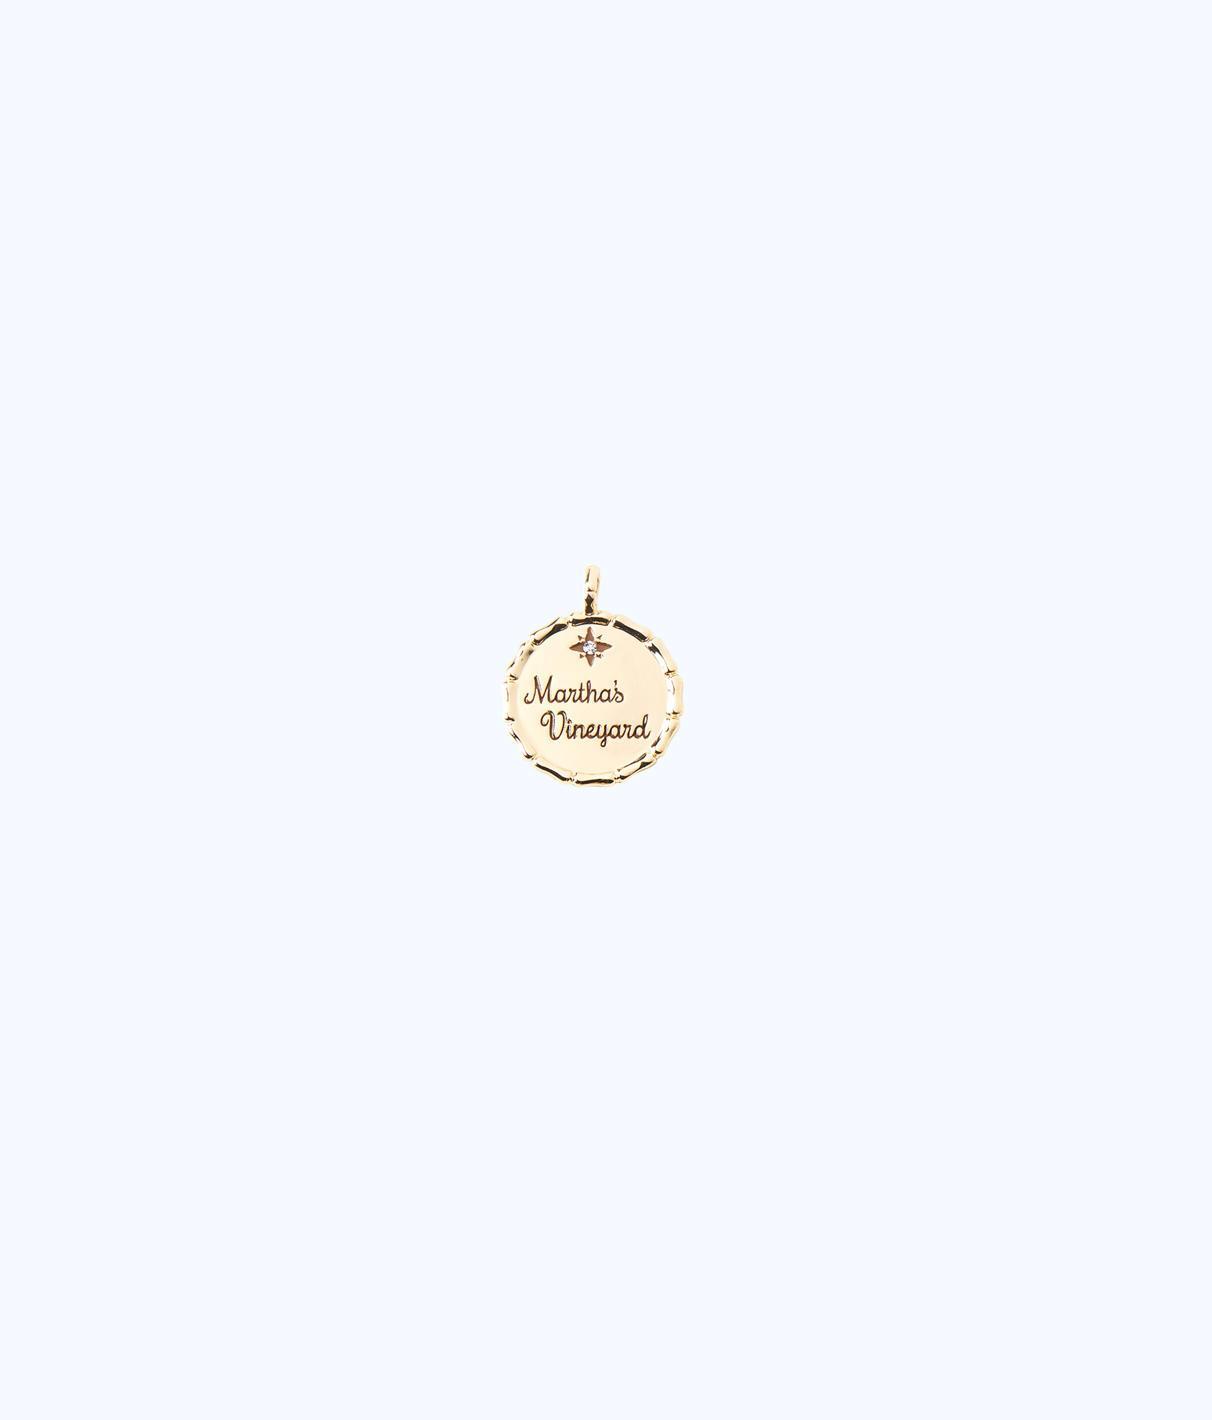 Lilly Pulitzer Location Charm - Amelia Island In Gold Metallic Dallas Charm